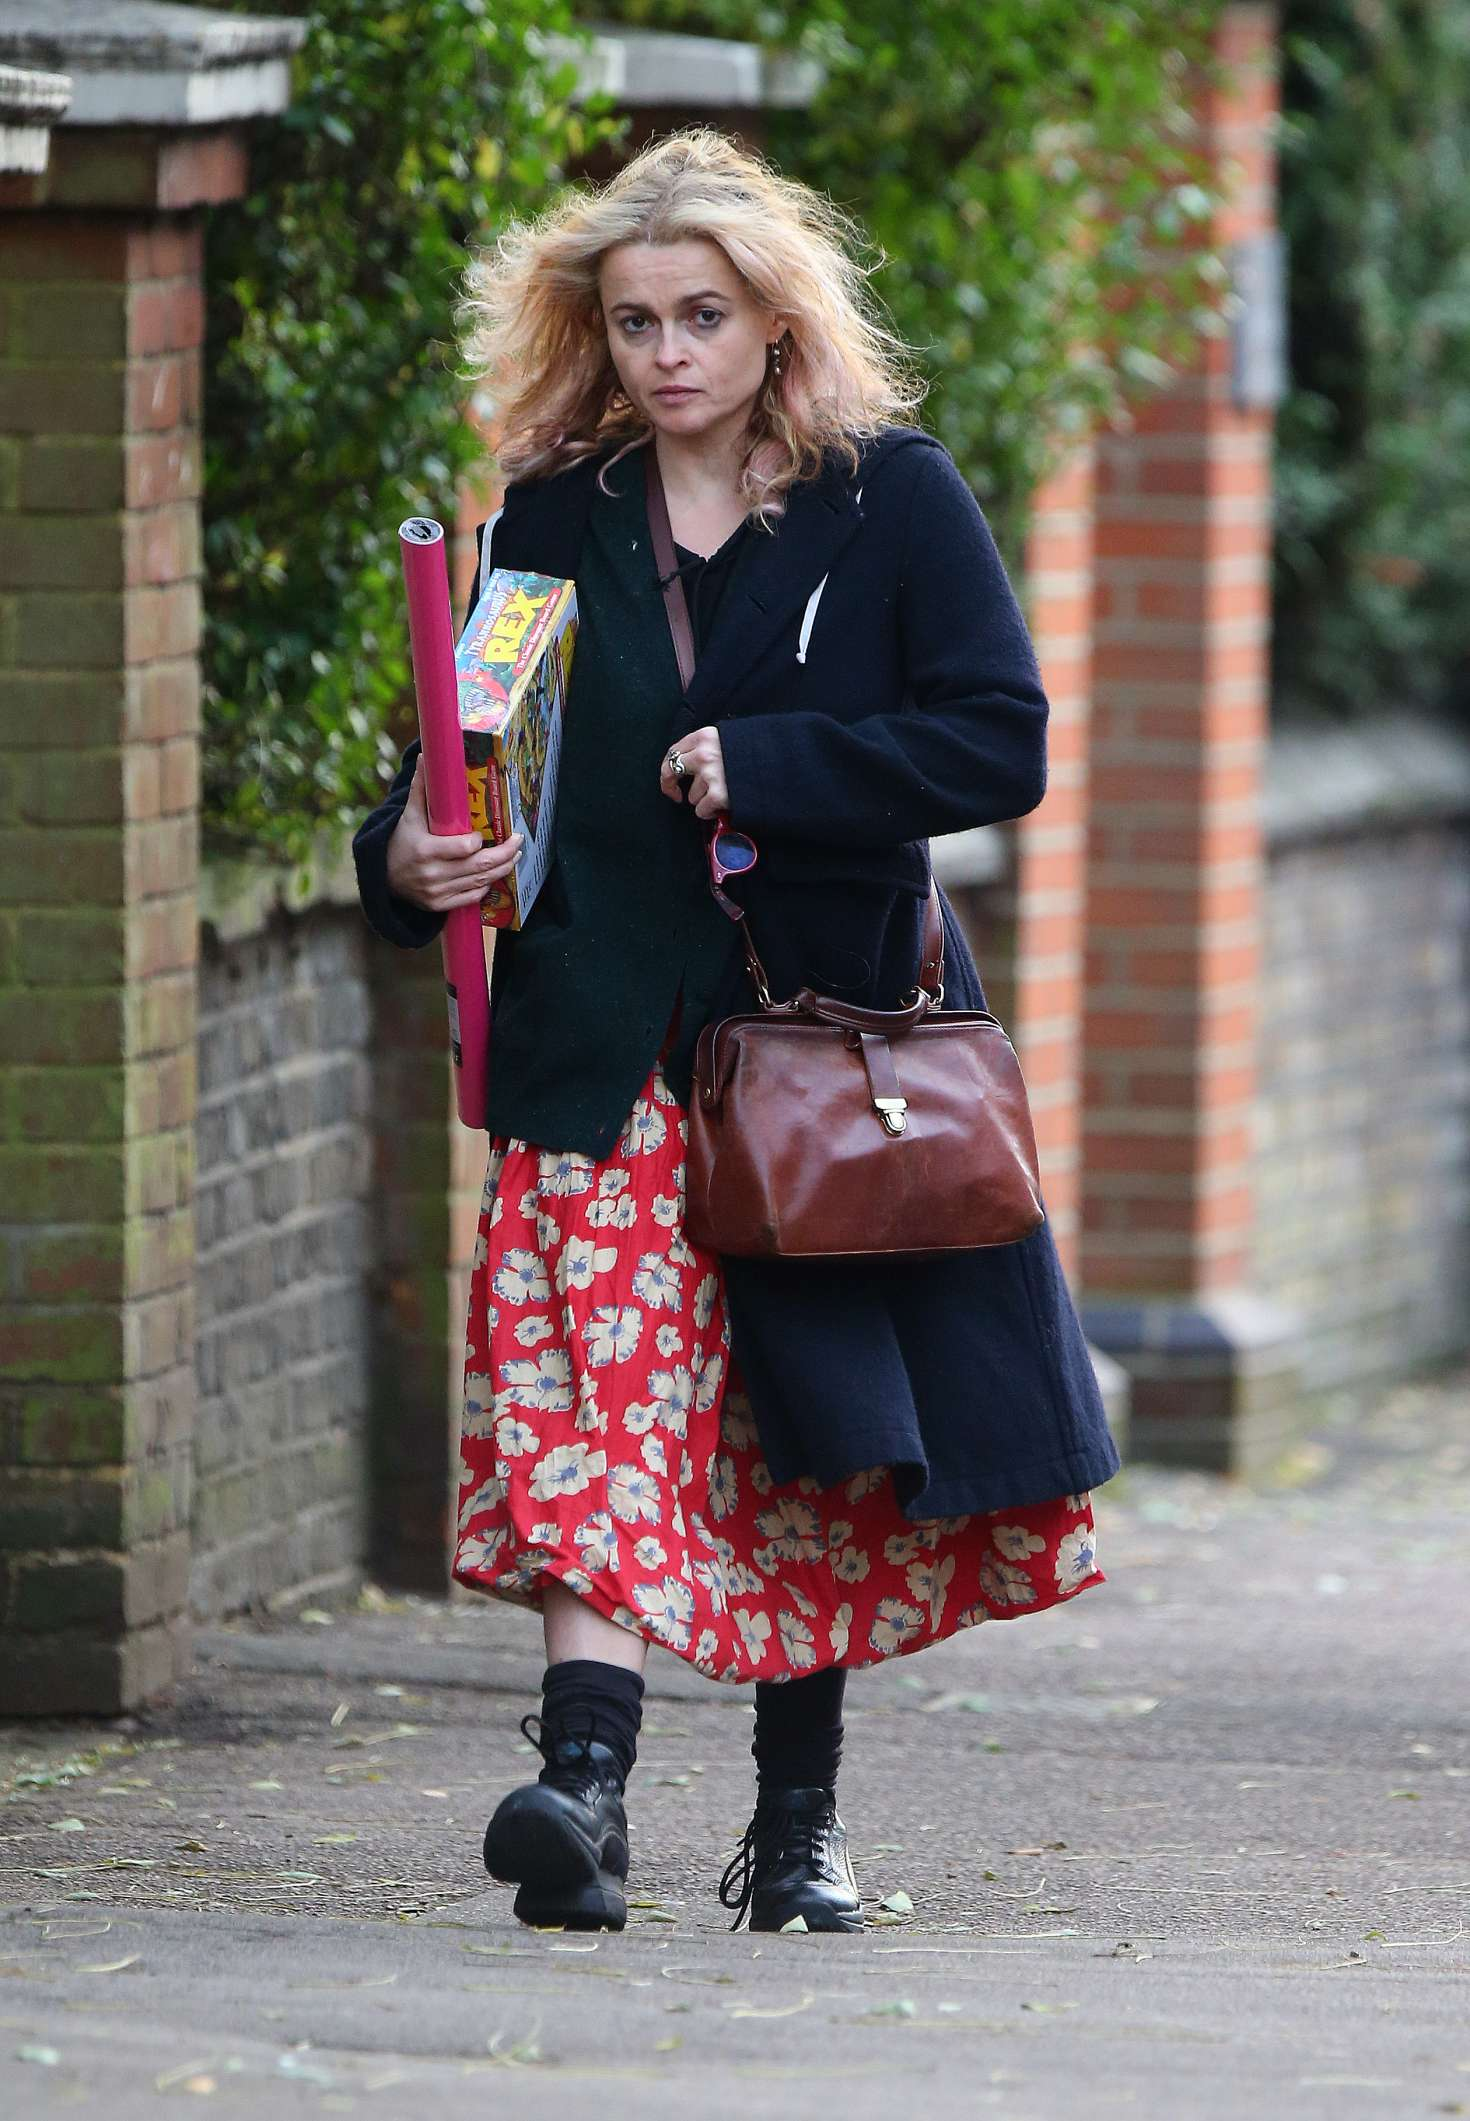 Helena Bonham Carter 2016 : Helena Bonham Carter: Christmas Shopping in London -08